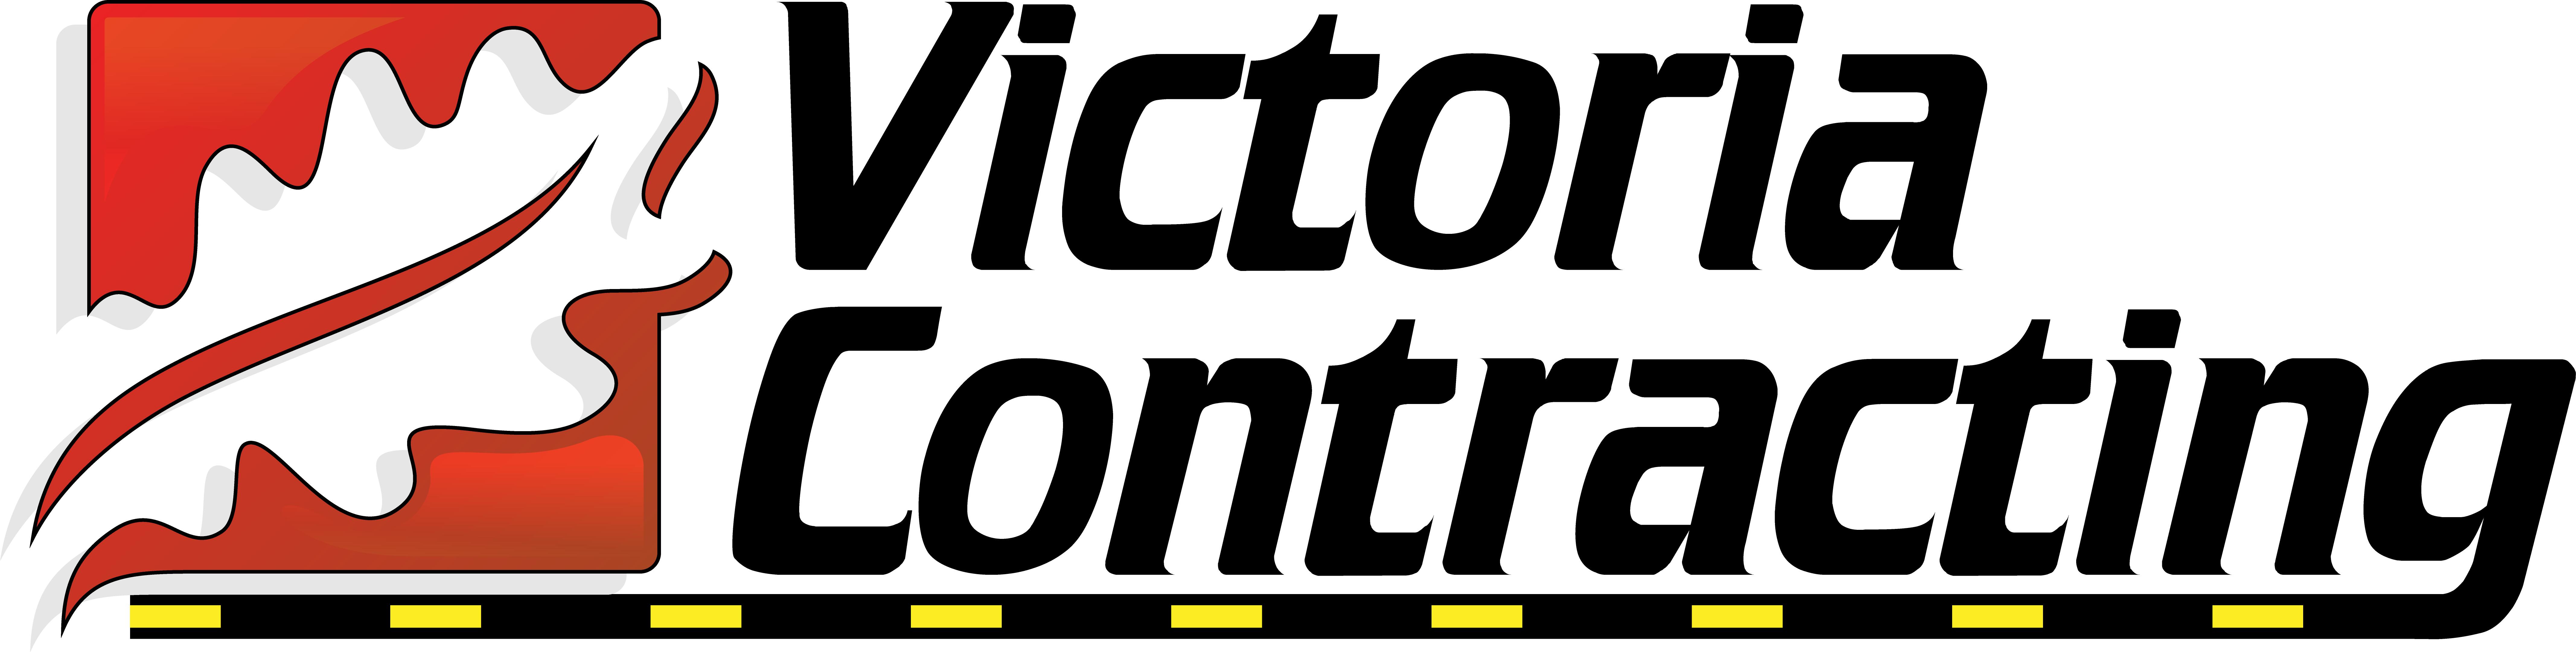 Victoria Contracting logo.